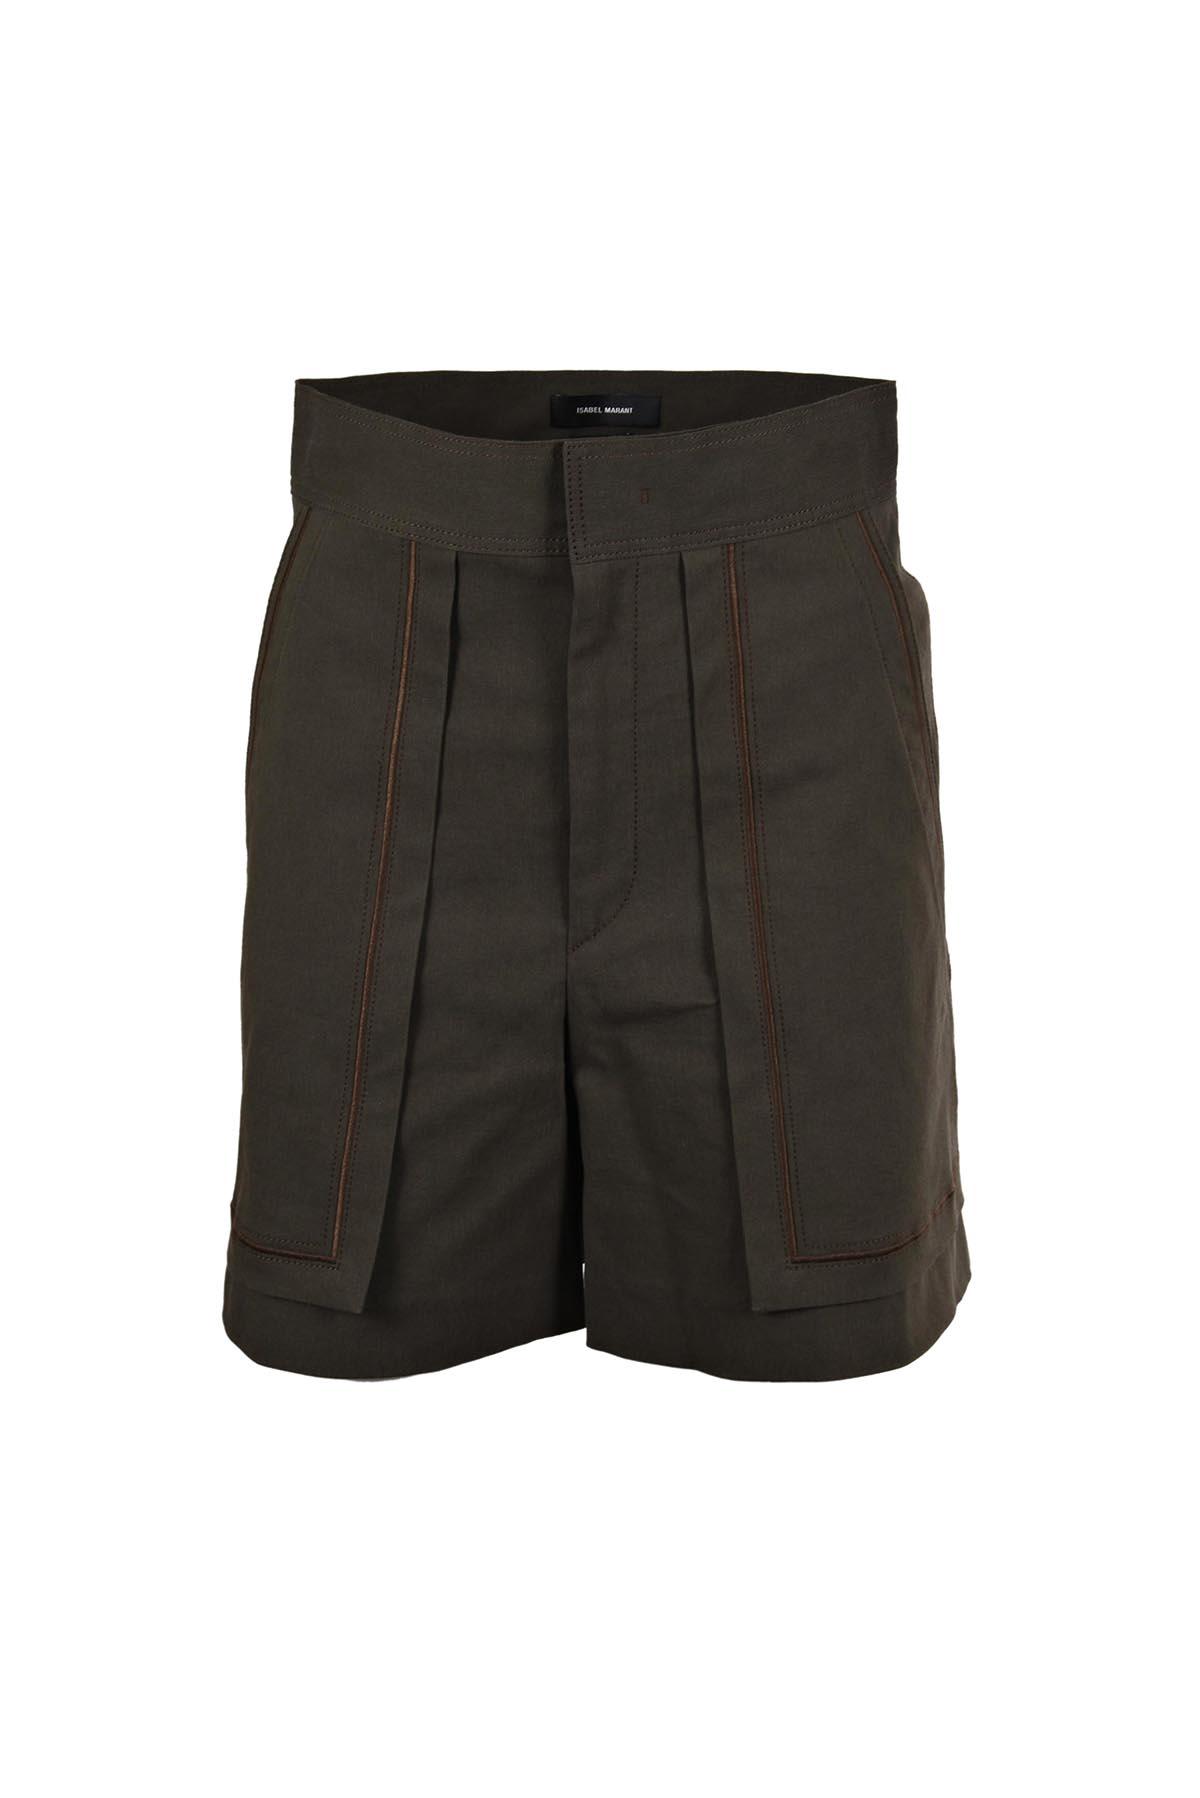 Isabel Marant Lucky Shorts